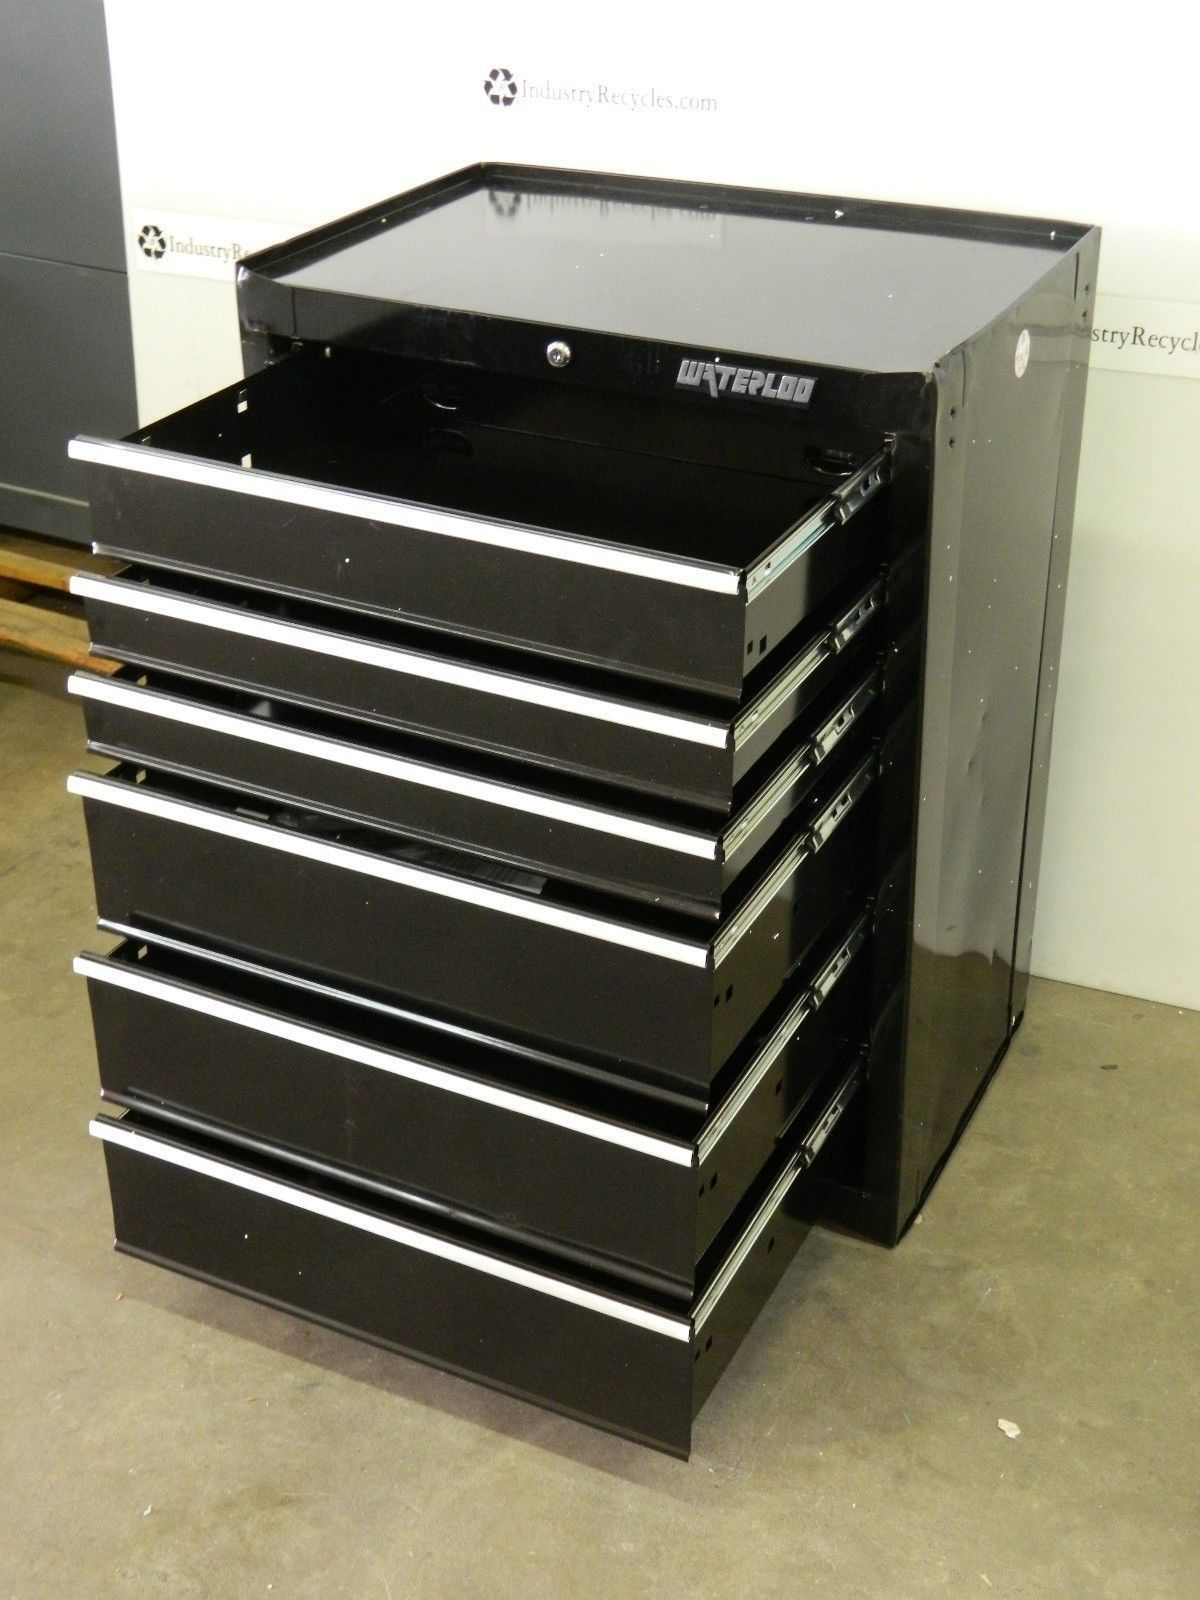 Waterloo wca 266bk roller cabinet tool box 6 drawer w for Sideboard roller